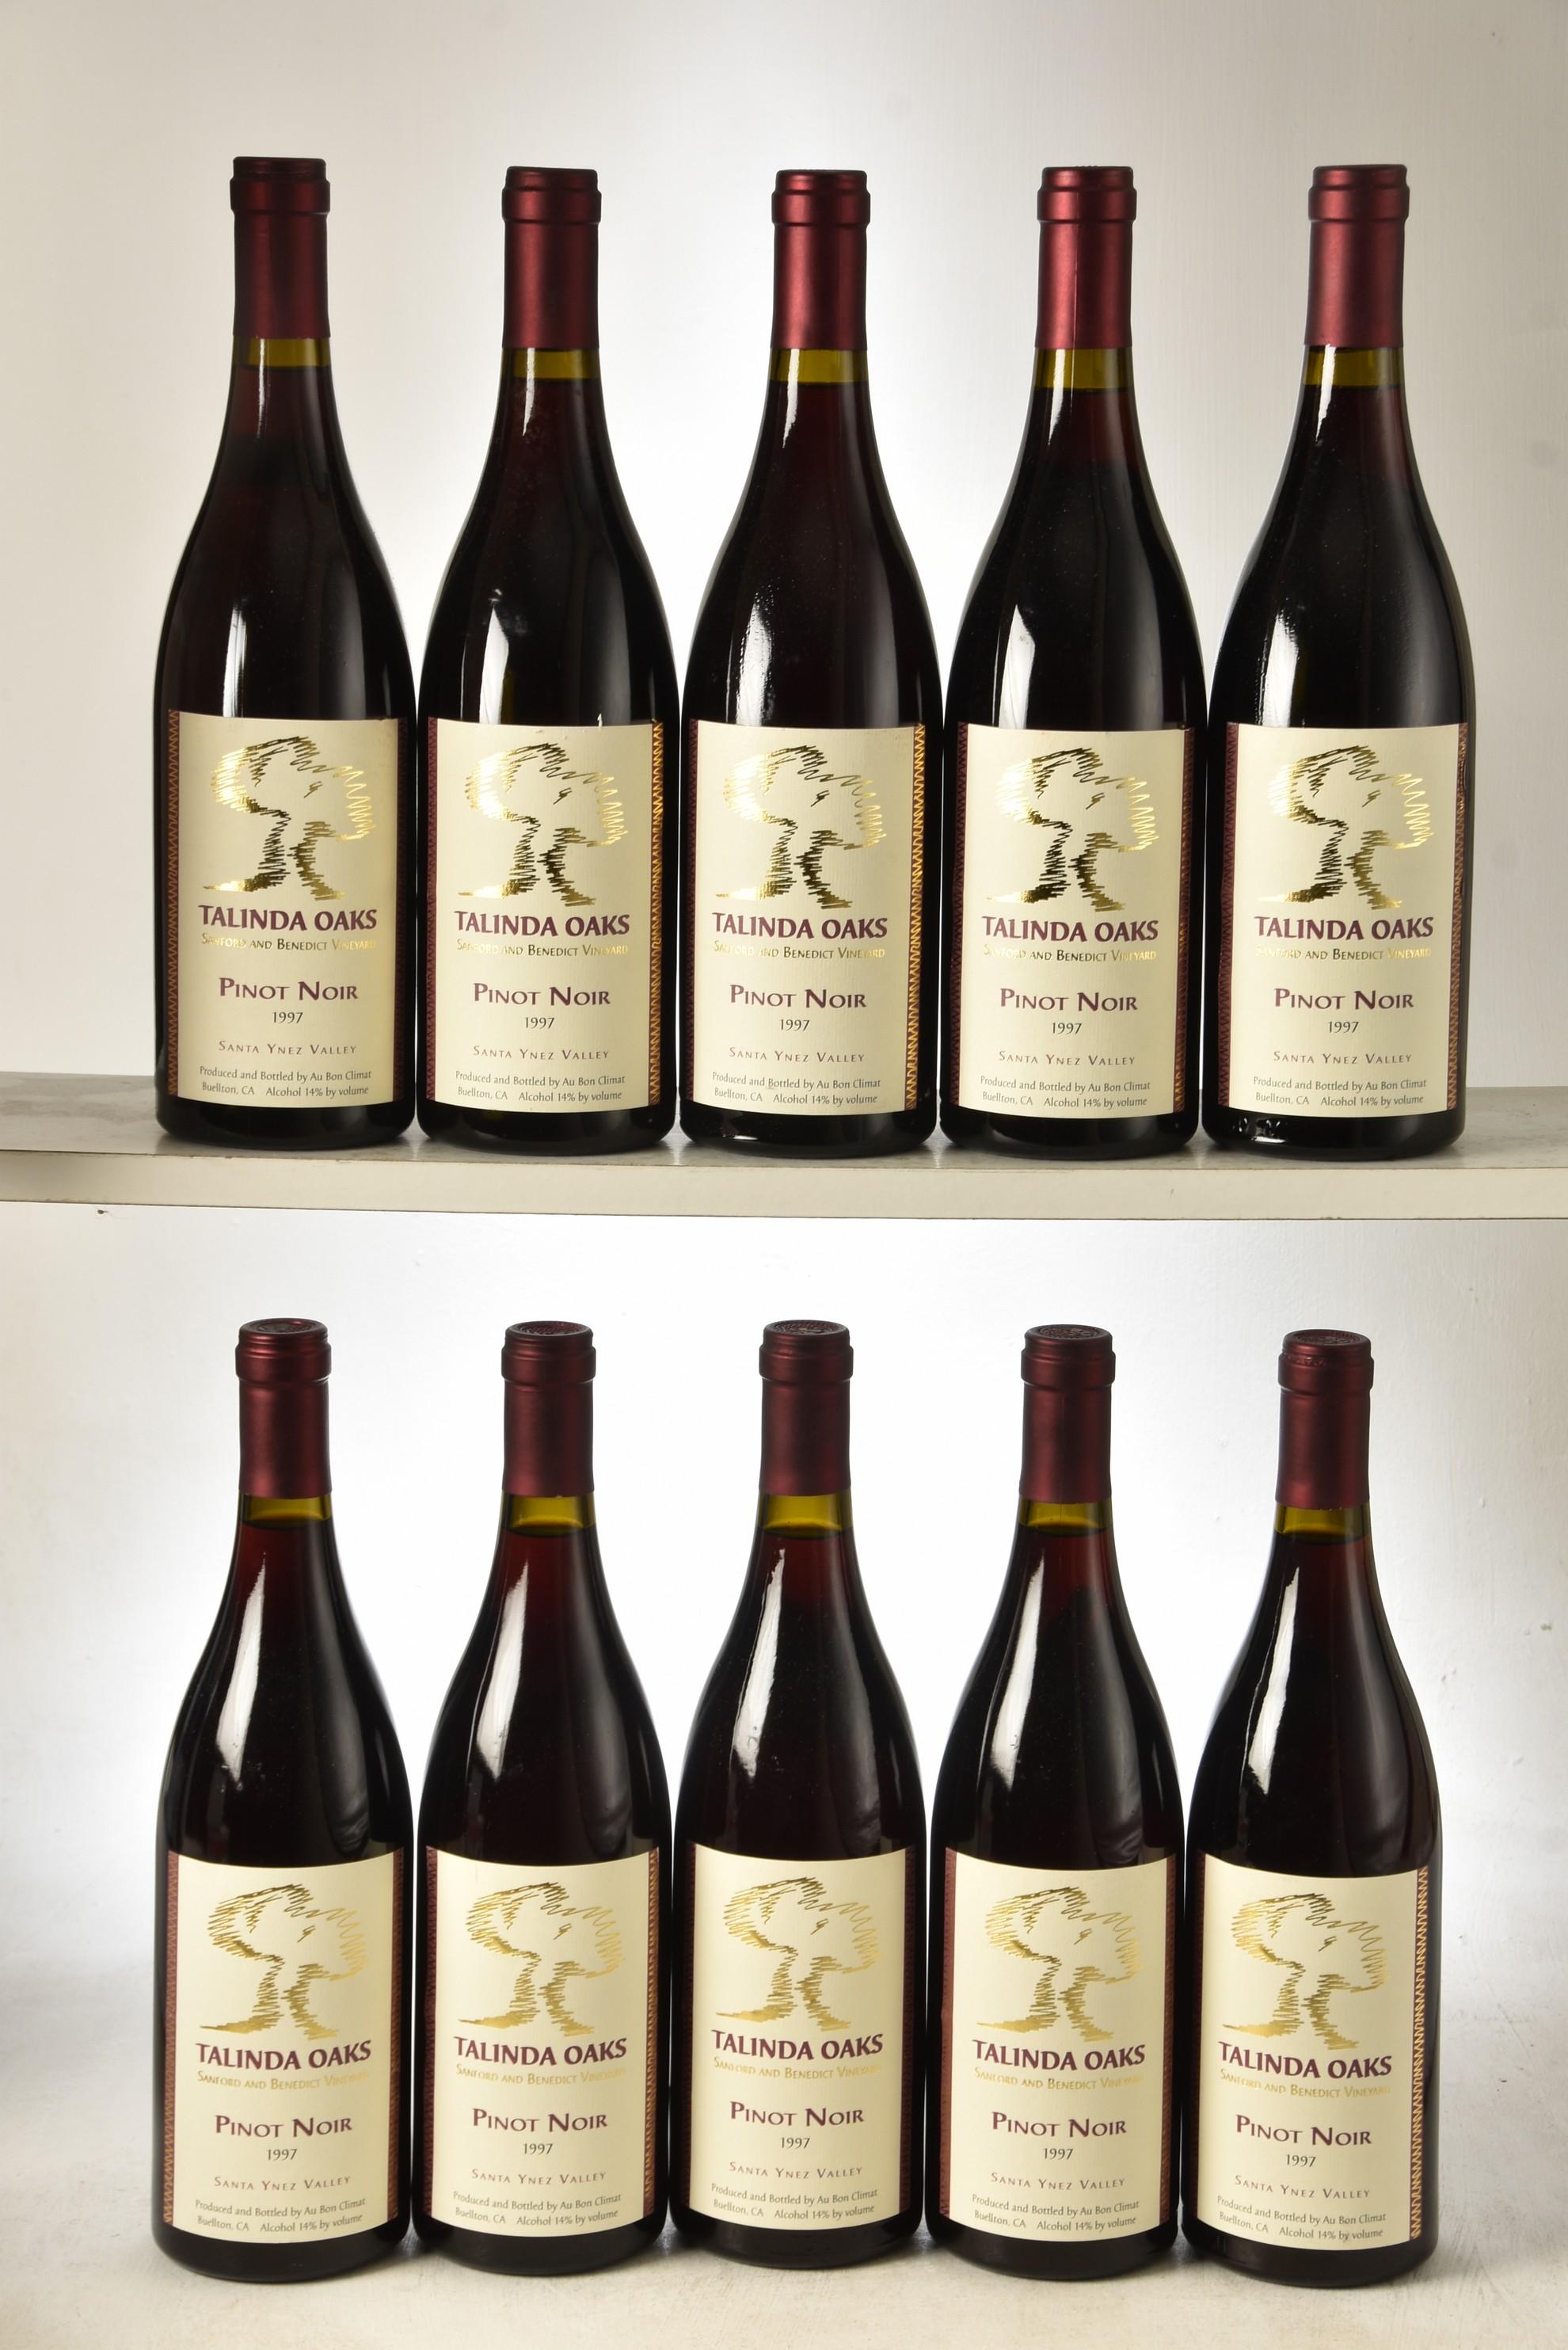 Talinda Oaks Pinot Noir 1997 10 bts